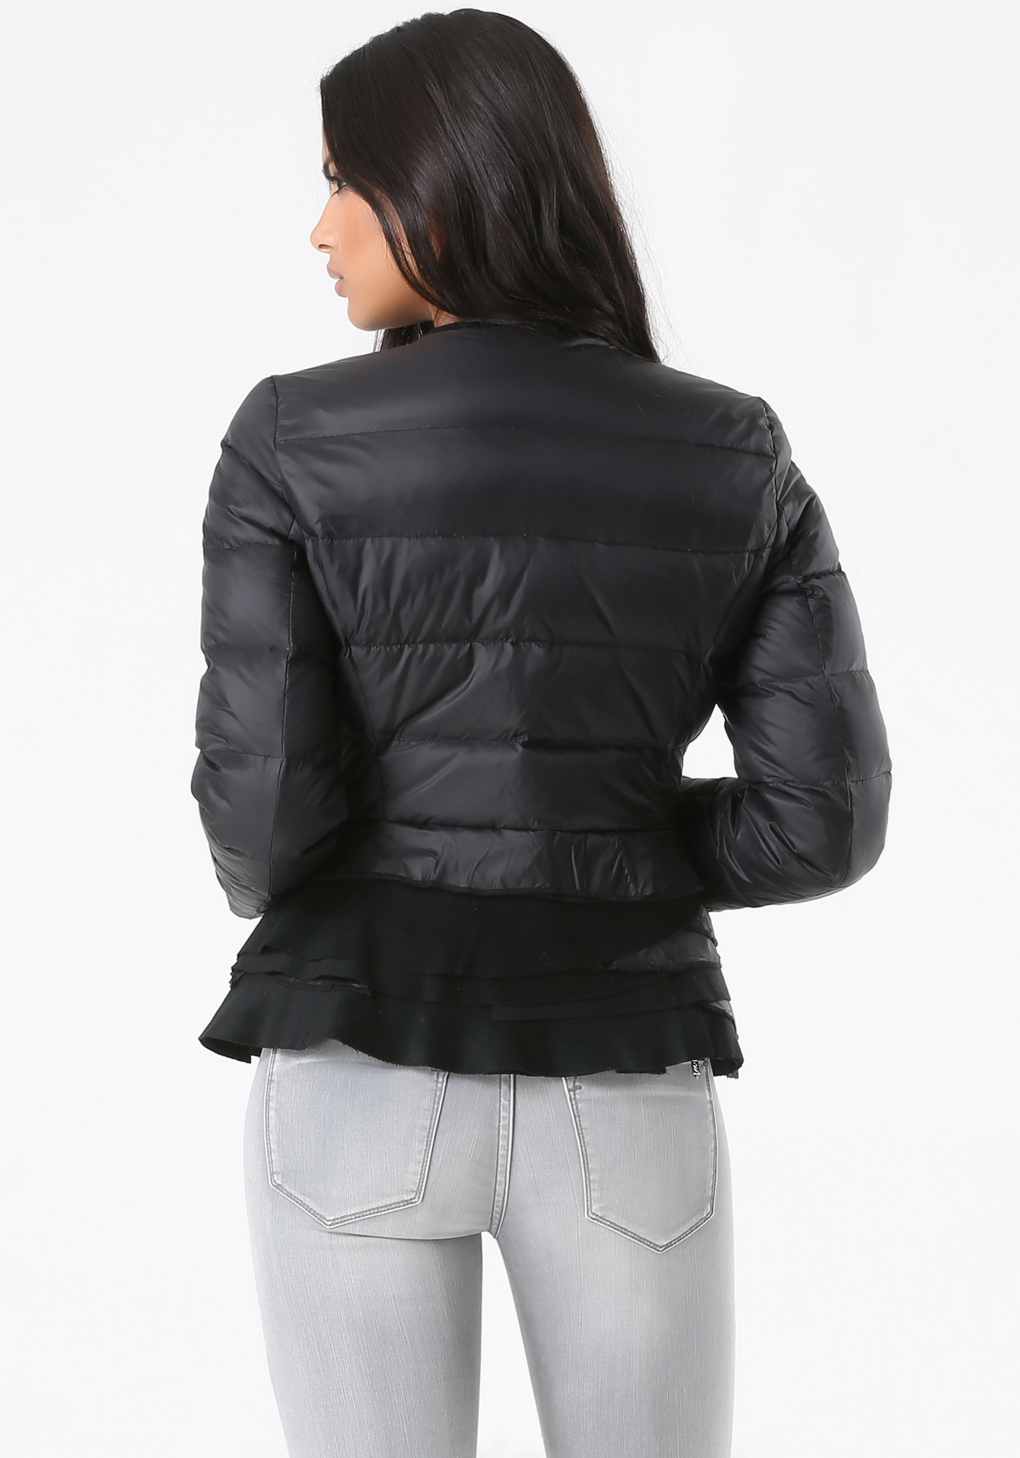 Bebe Peplum Puffer Jacket in Black - Lyst